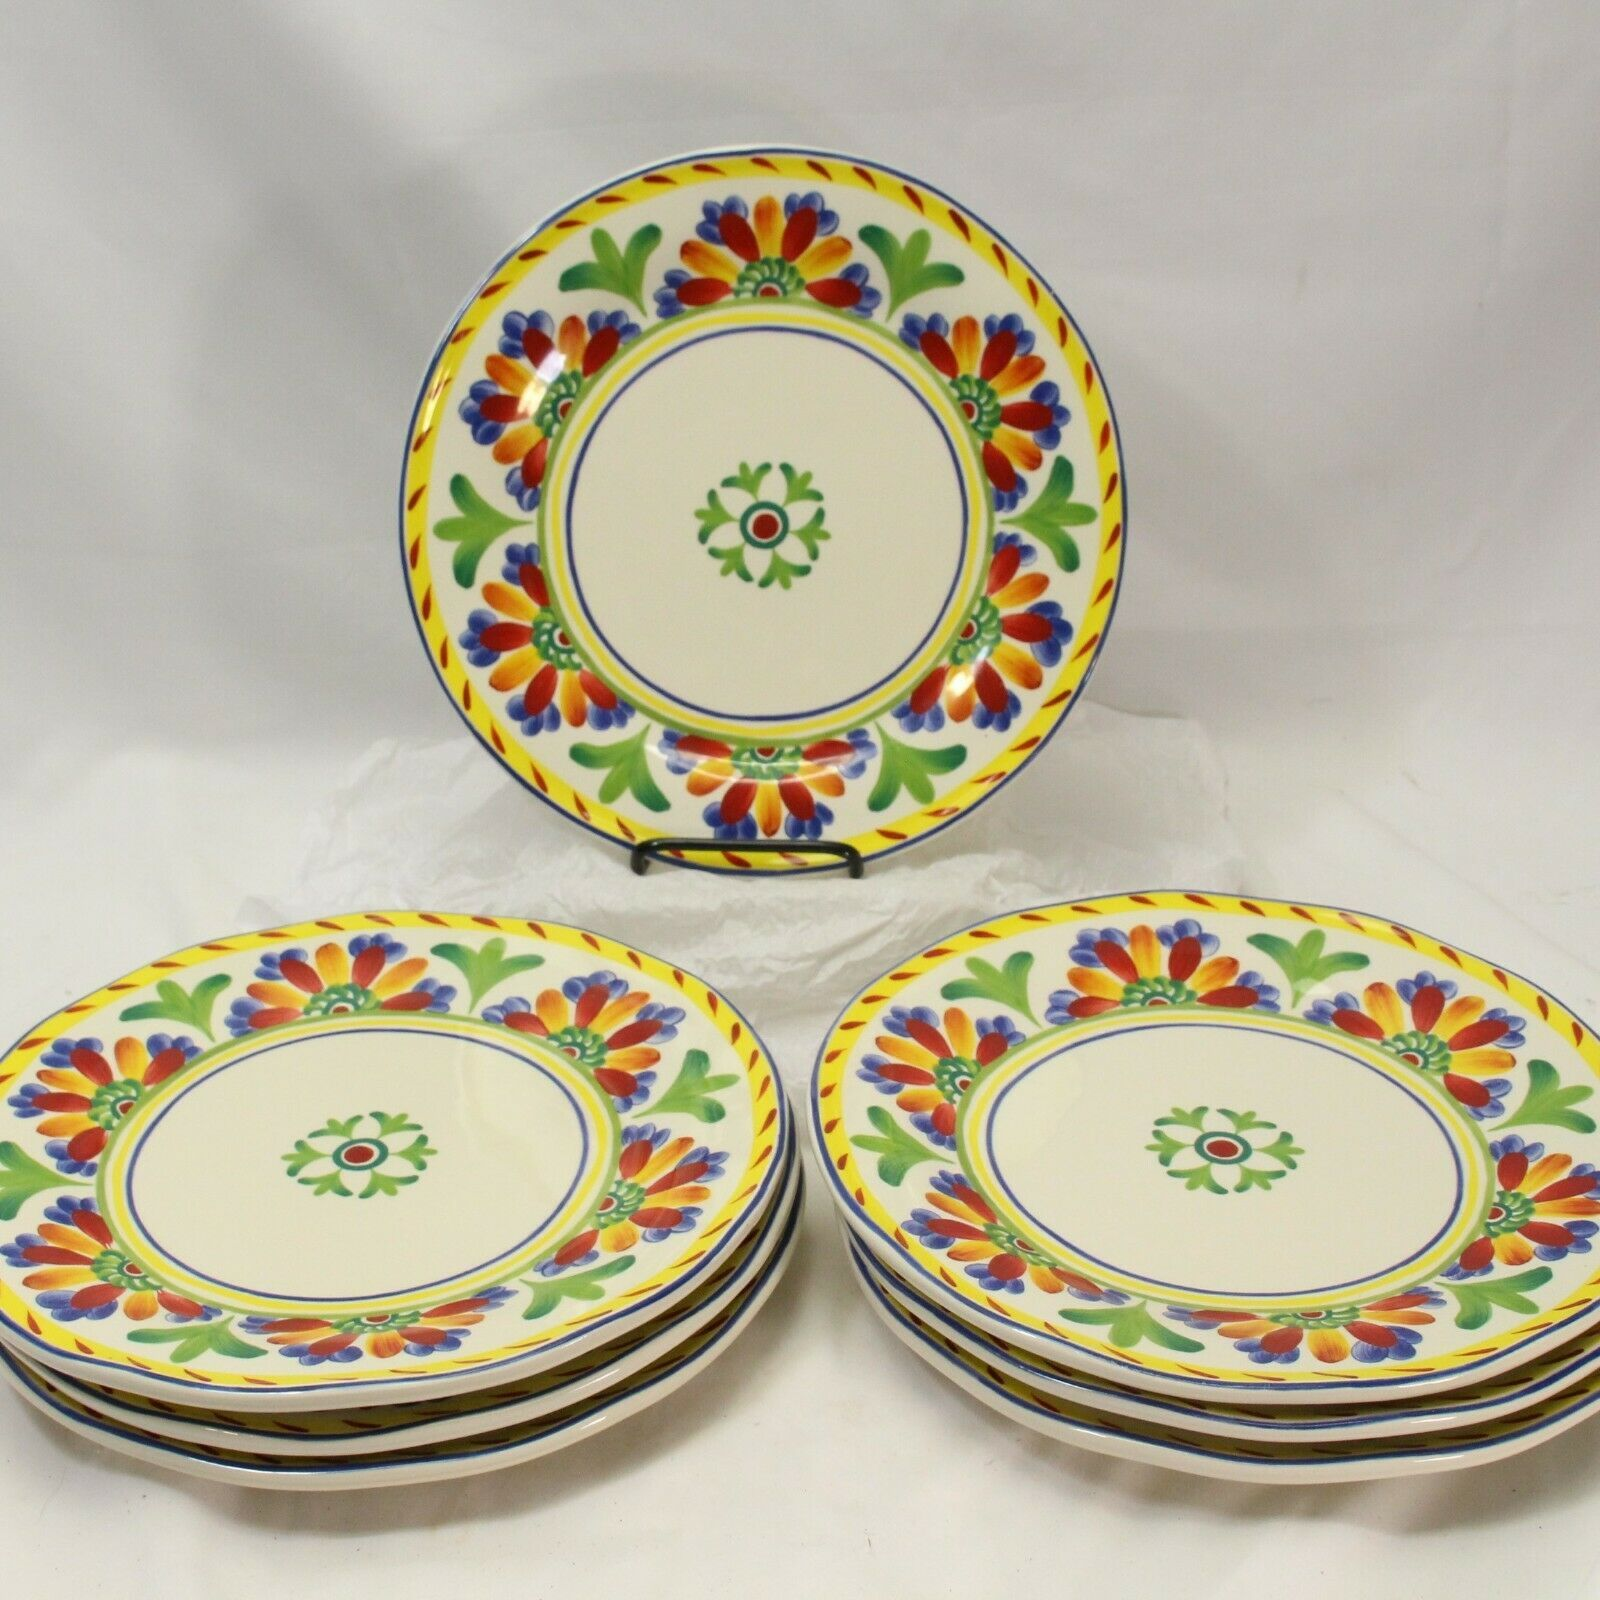 Cert International Joyce Shelton Studios Amalfi Palermo Dinner Plates Lot of 7 - $97.99